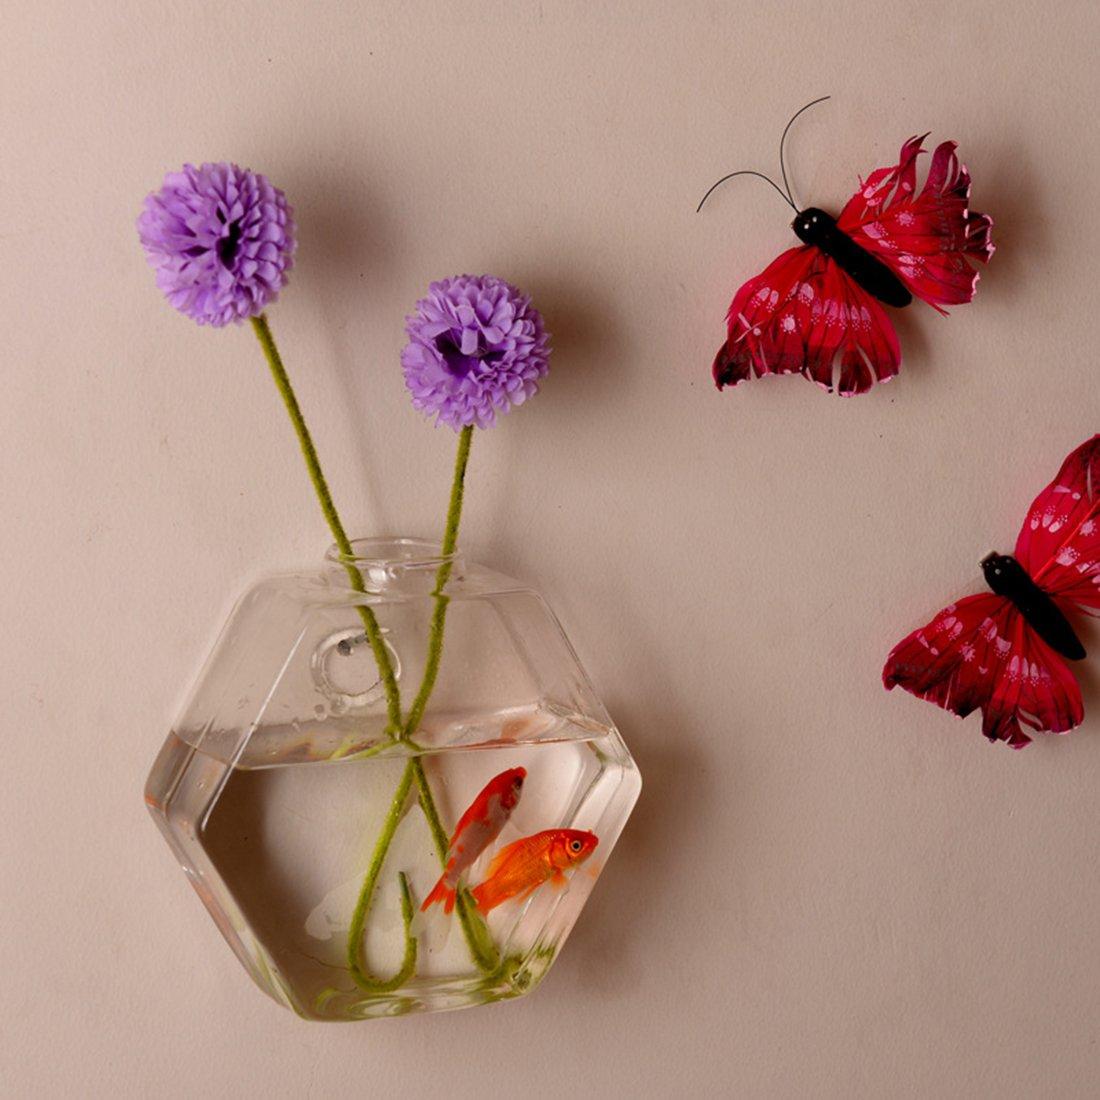 Creative Fish Bowls Hanging Vase Wall Decor Hanging Aquarium Decoration for Living Room Size 6.7 inch RuiyiF Fish Tank Wall Mounted